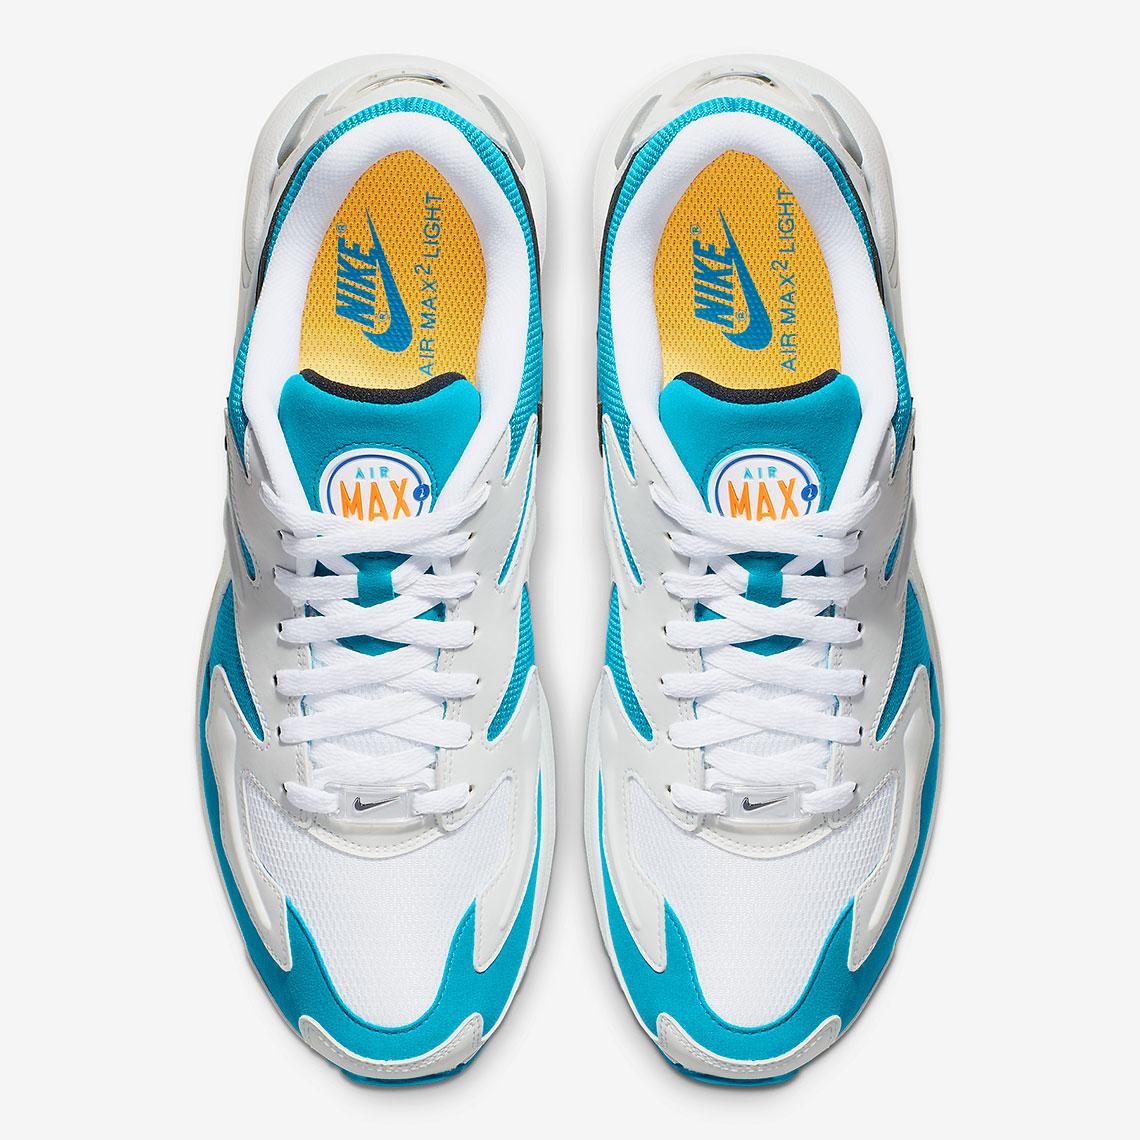 Nike-Air-Max-Light-2-AO1741_100-4.jpg